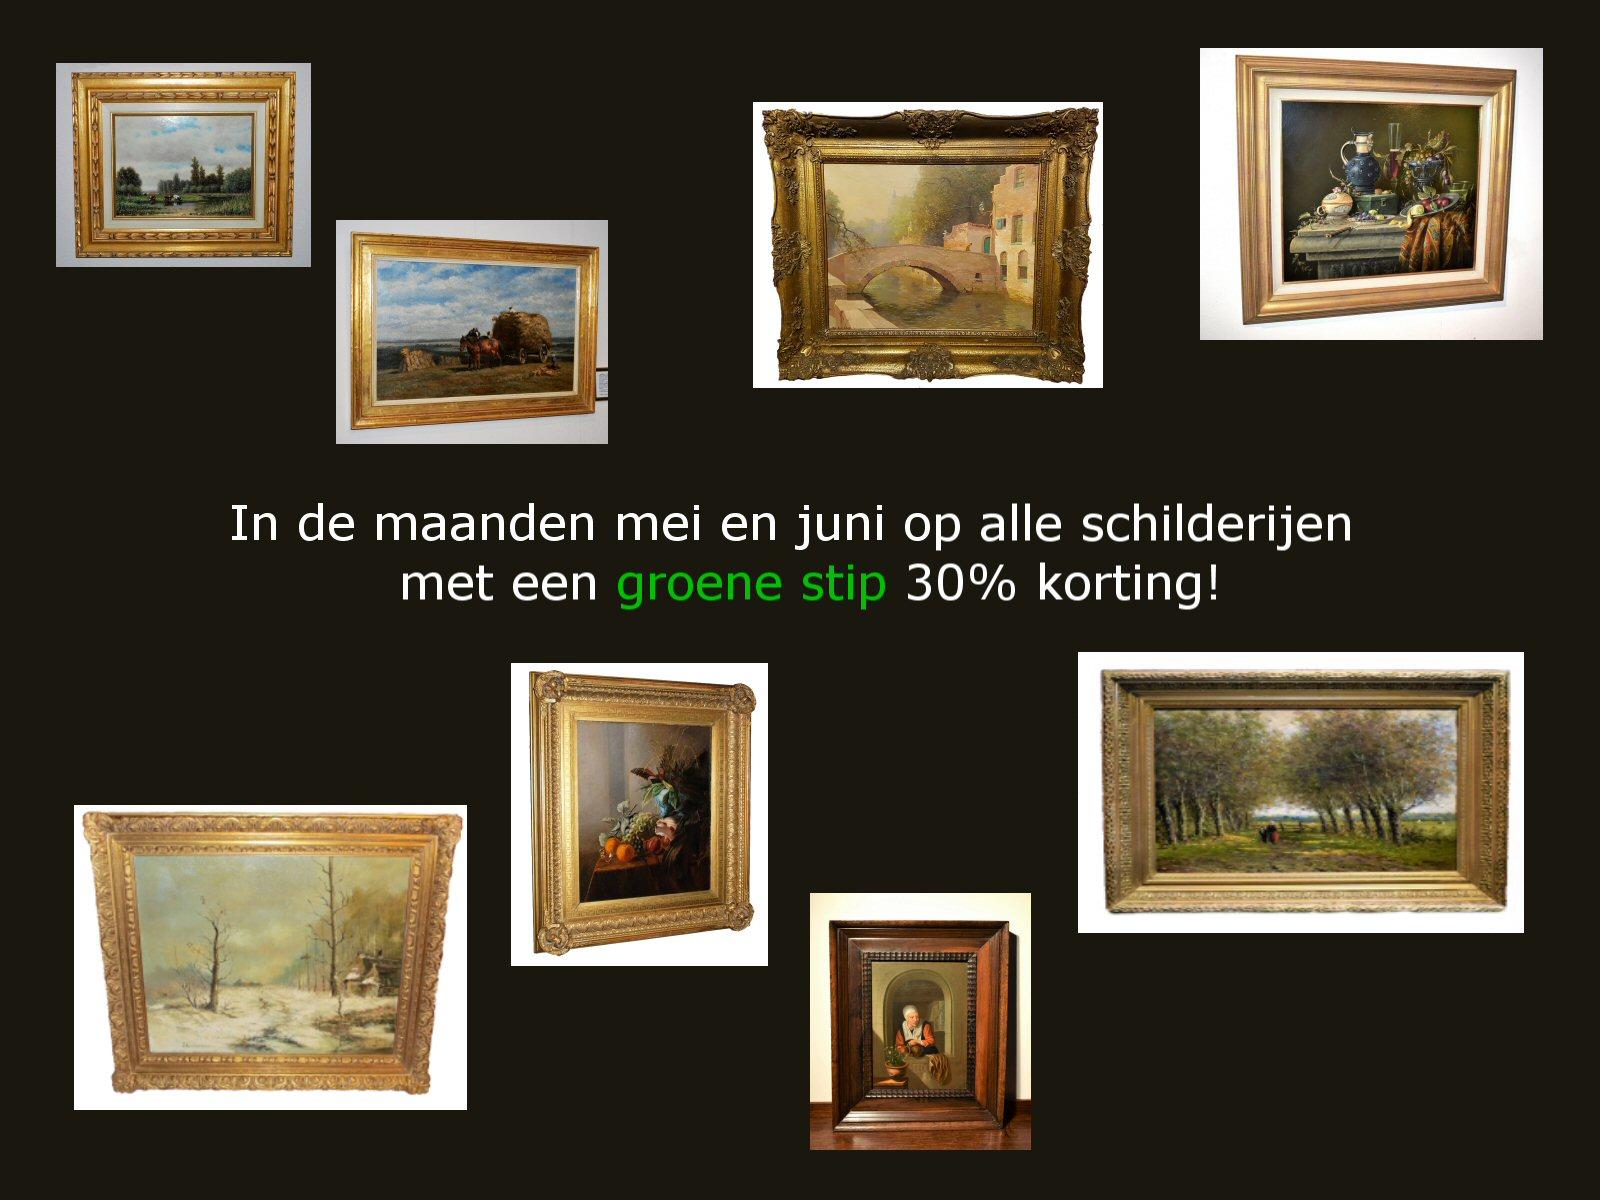 Schilderijen 30% korting. Heesakkers, Zwart, Heppener, Knikker, Moeve, Breedveld